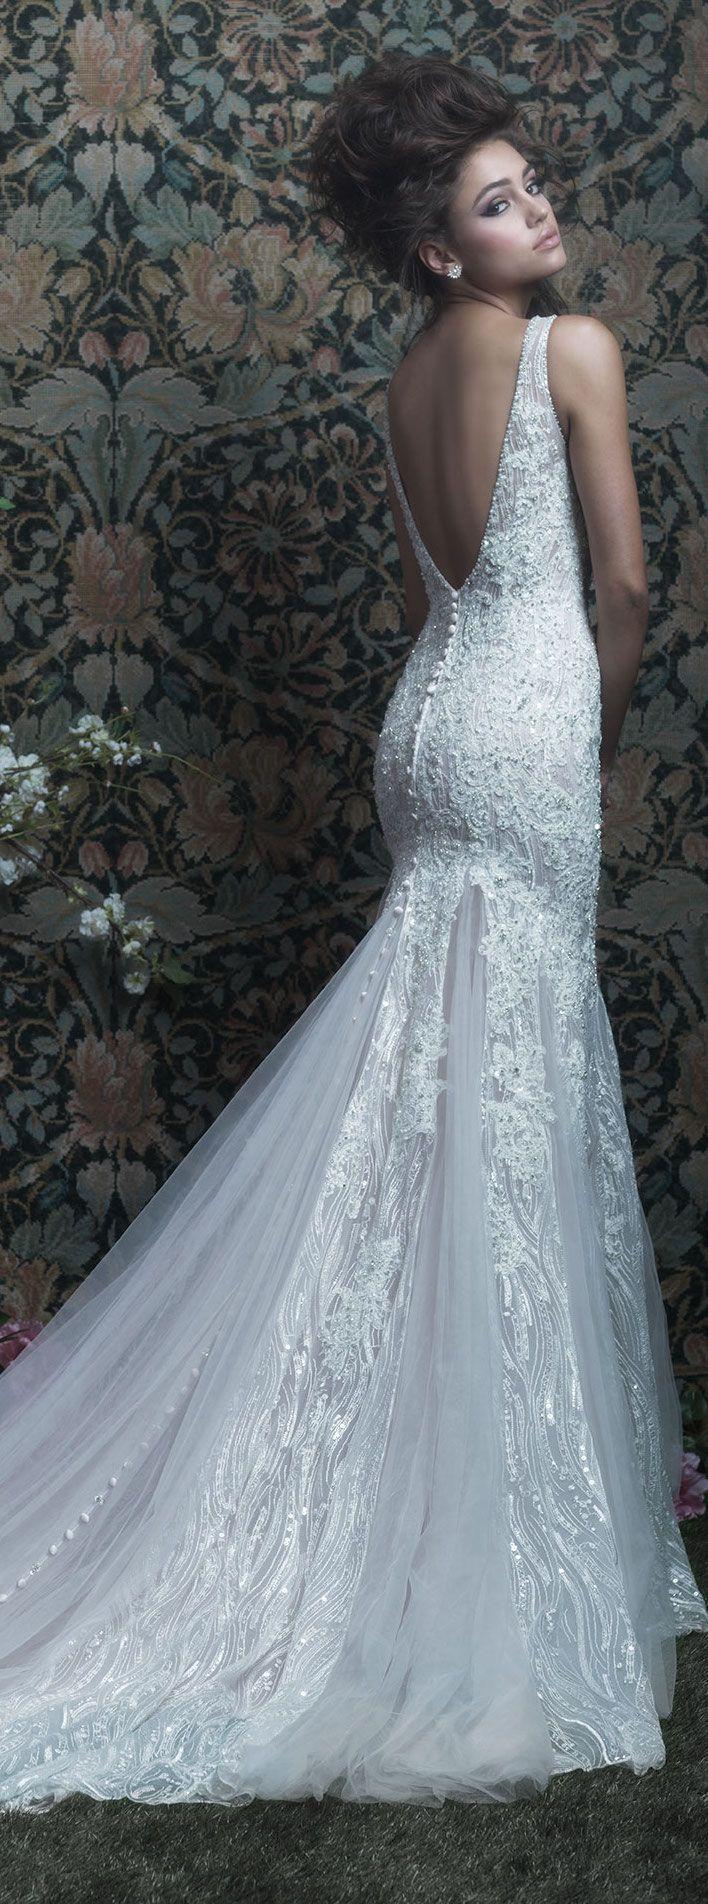 612 best Elaborate Wedding Dresses images on Pinterest | Brides ...